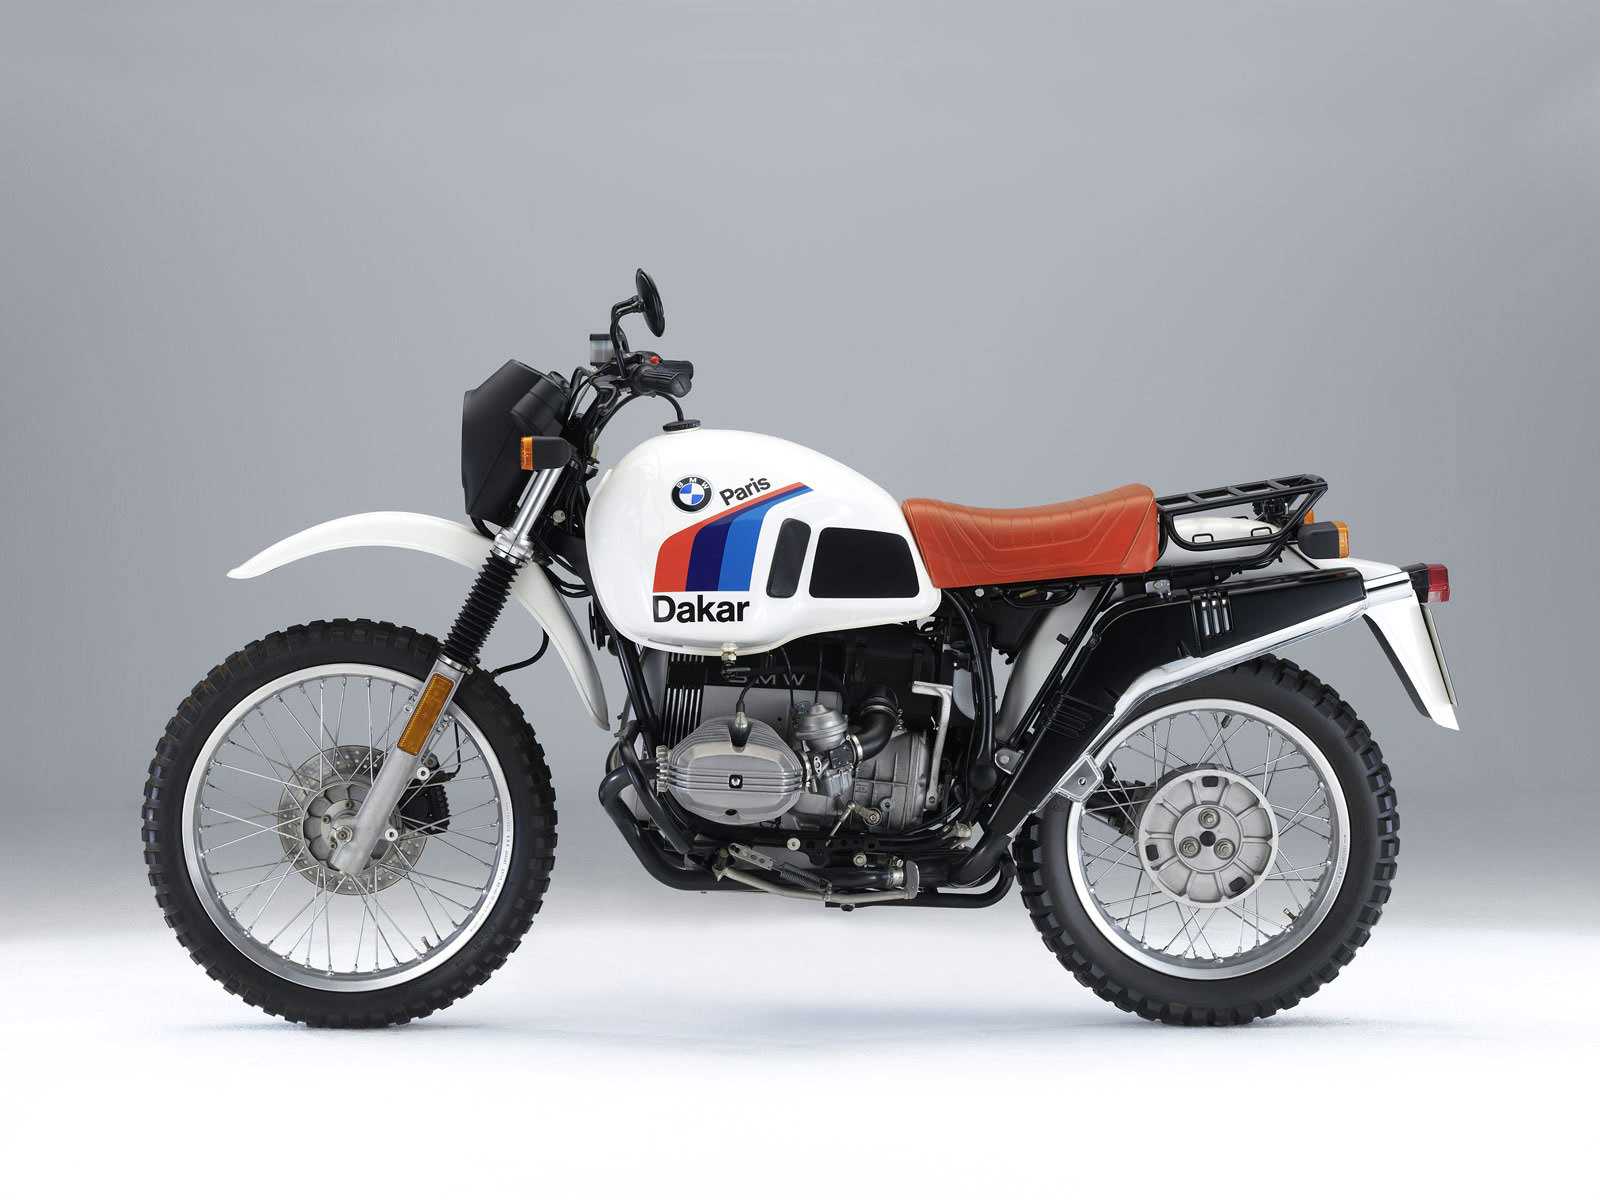 2010 Bmw R80gs Paris Dakar Motorcycle Wallpapers Auto Electrical Wiring Diagram